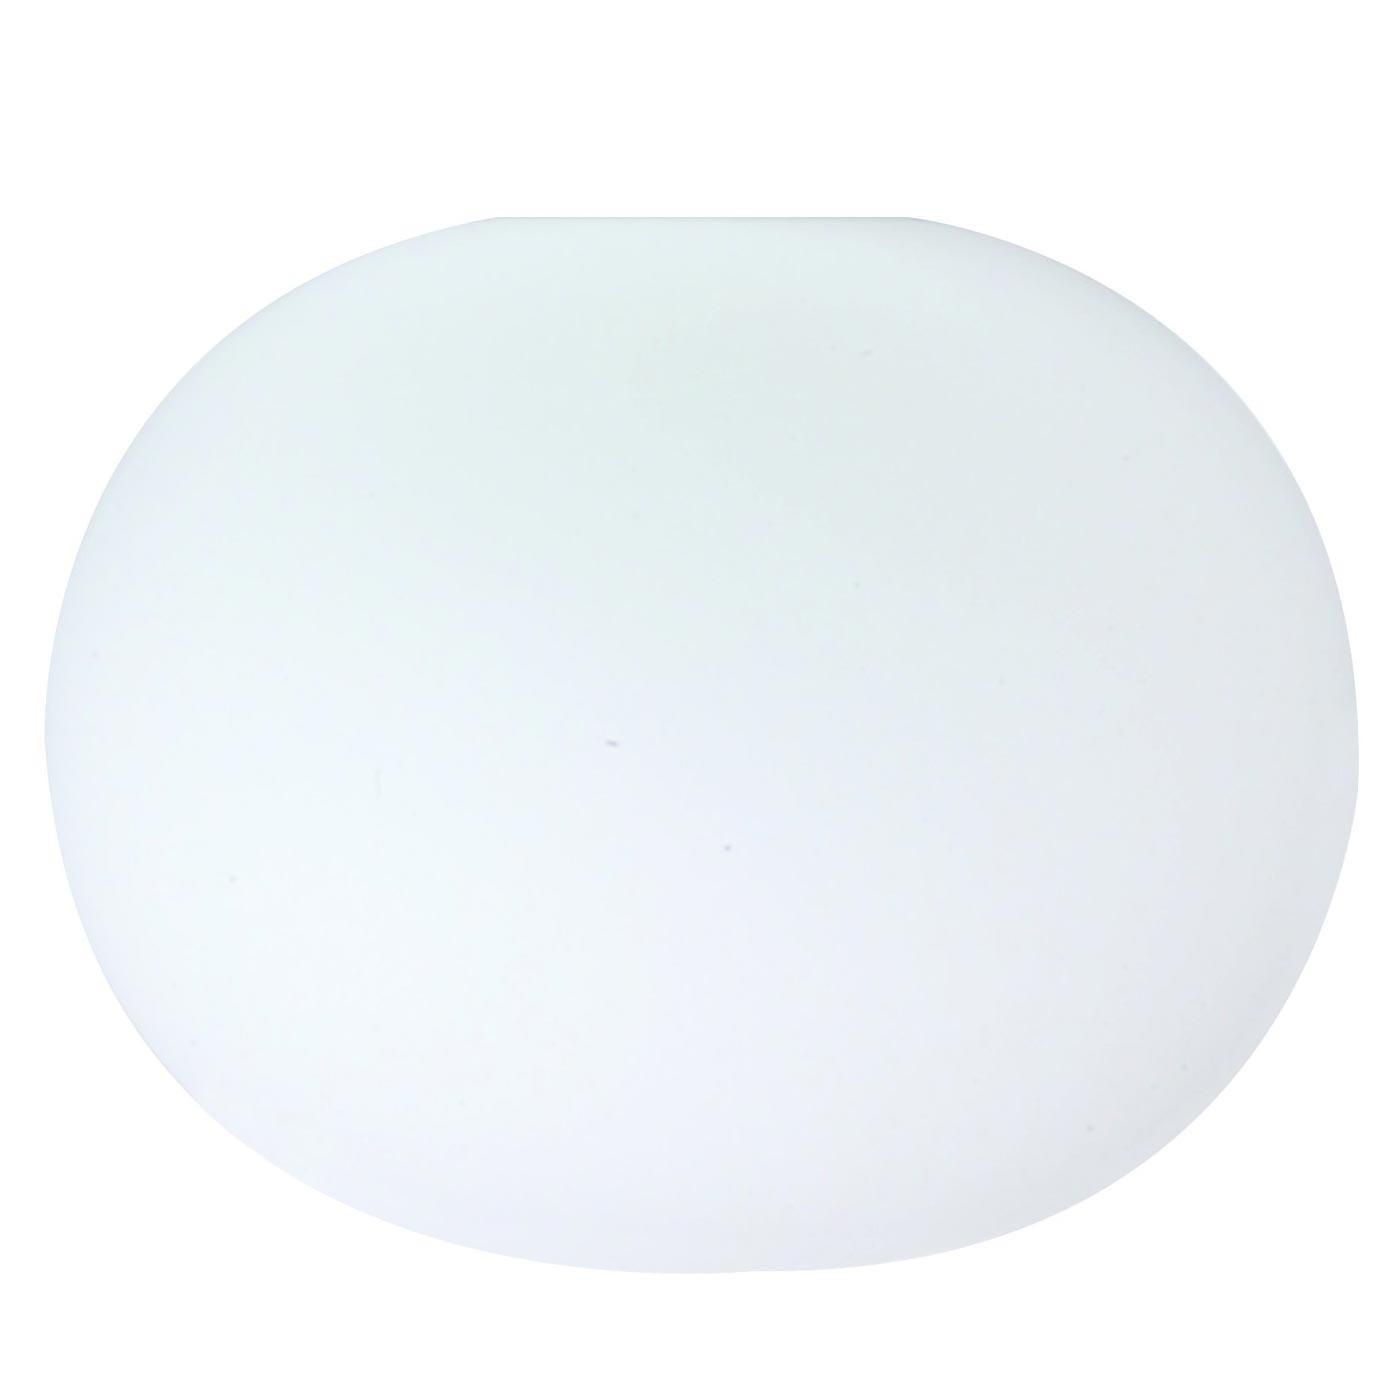 Flos Glo-Ball Basic 2, C2, F3, T2 Ersatzglas